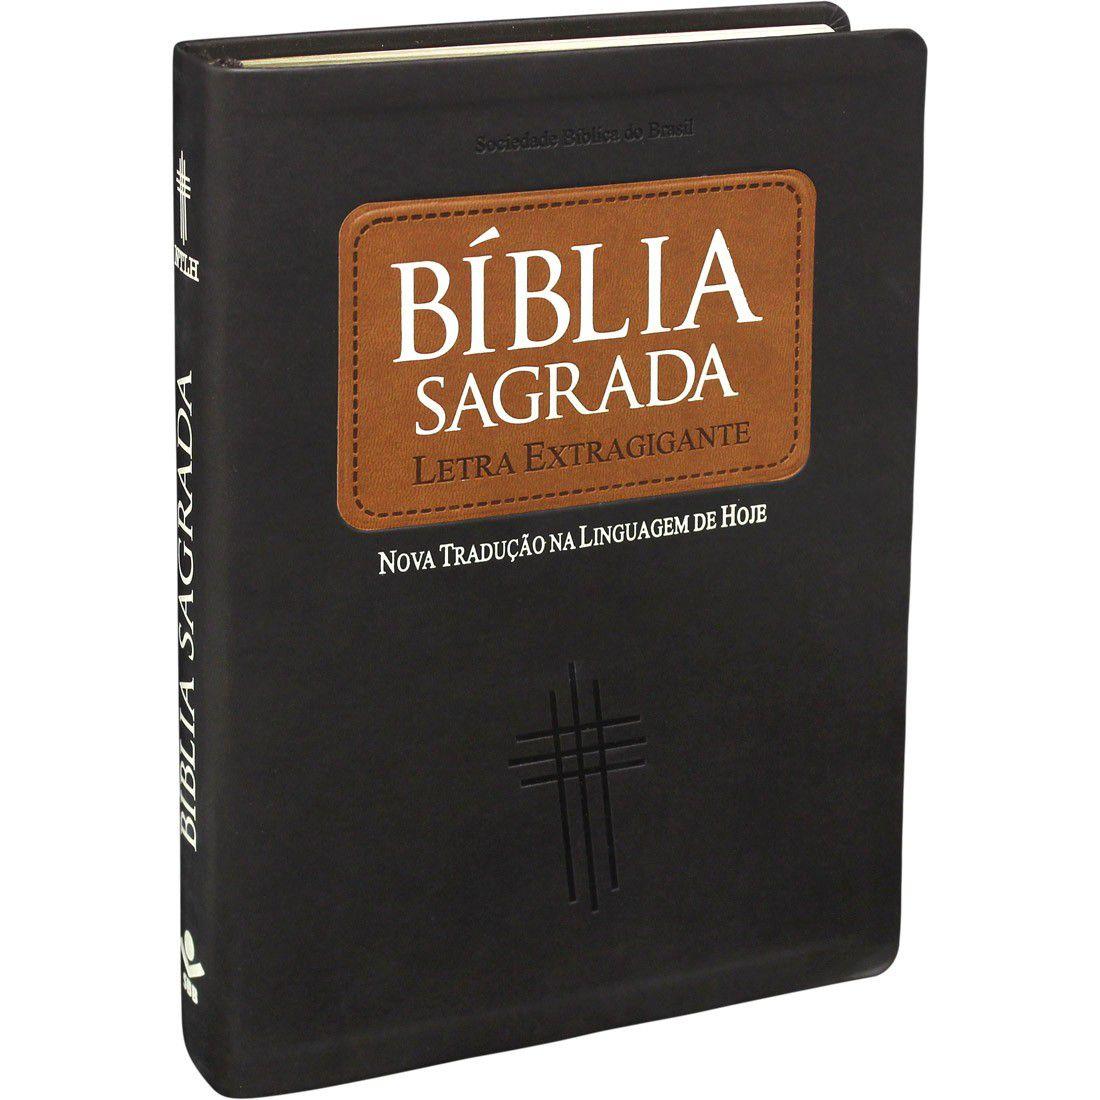 Bíblia Sagrada  Evangélica NTLH  Letra Extragigante  Capa Luxo c/ Índice Lateral